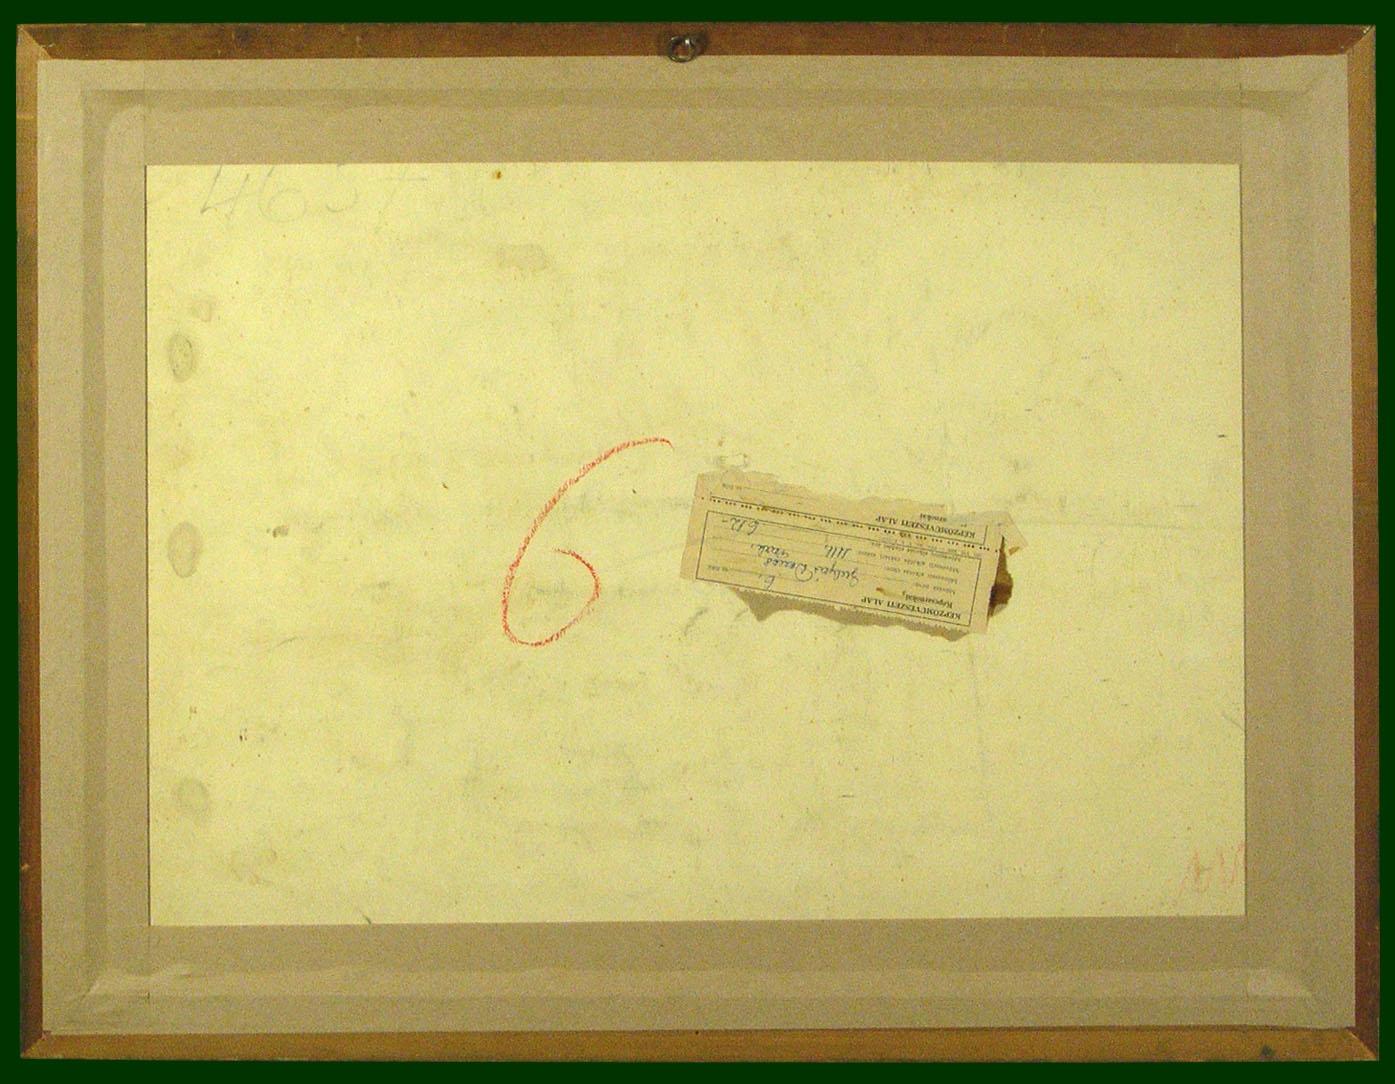 52-2hat.JPG (1395×1084)